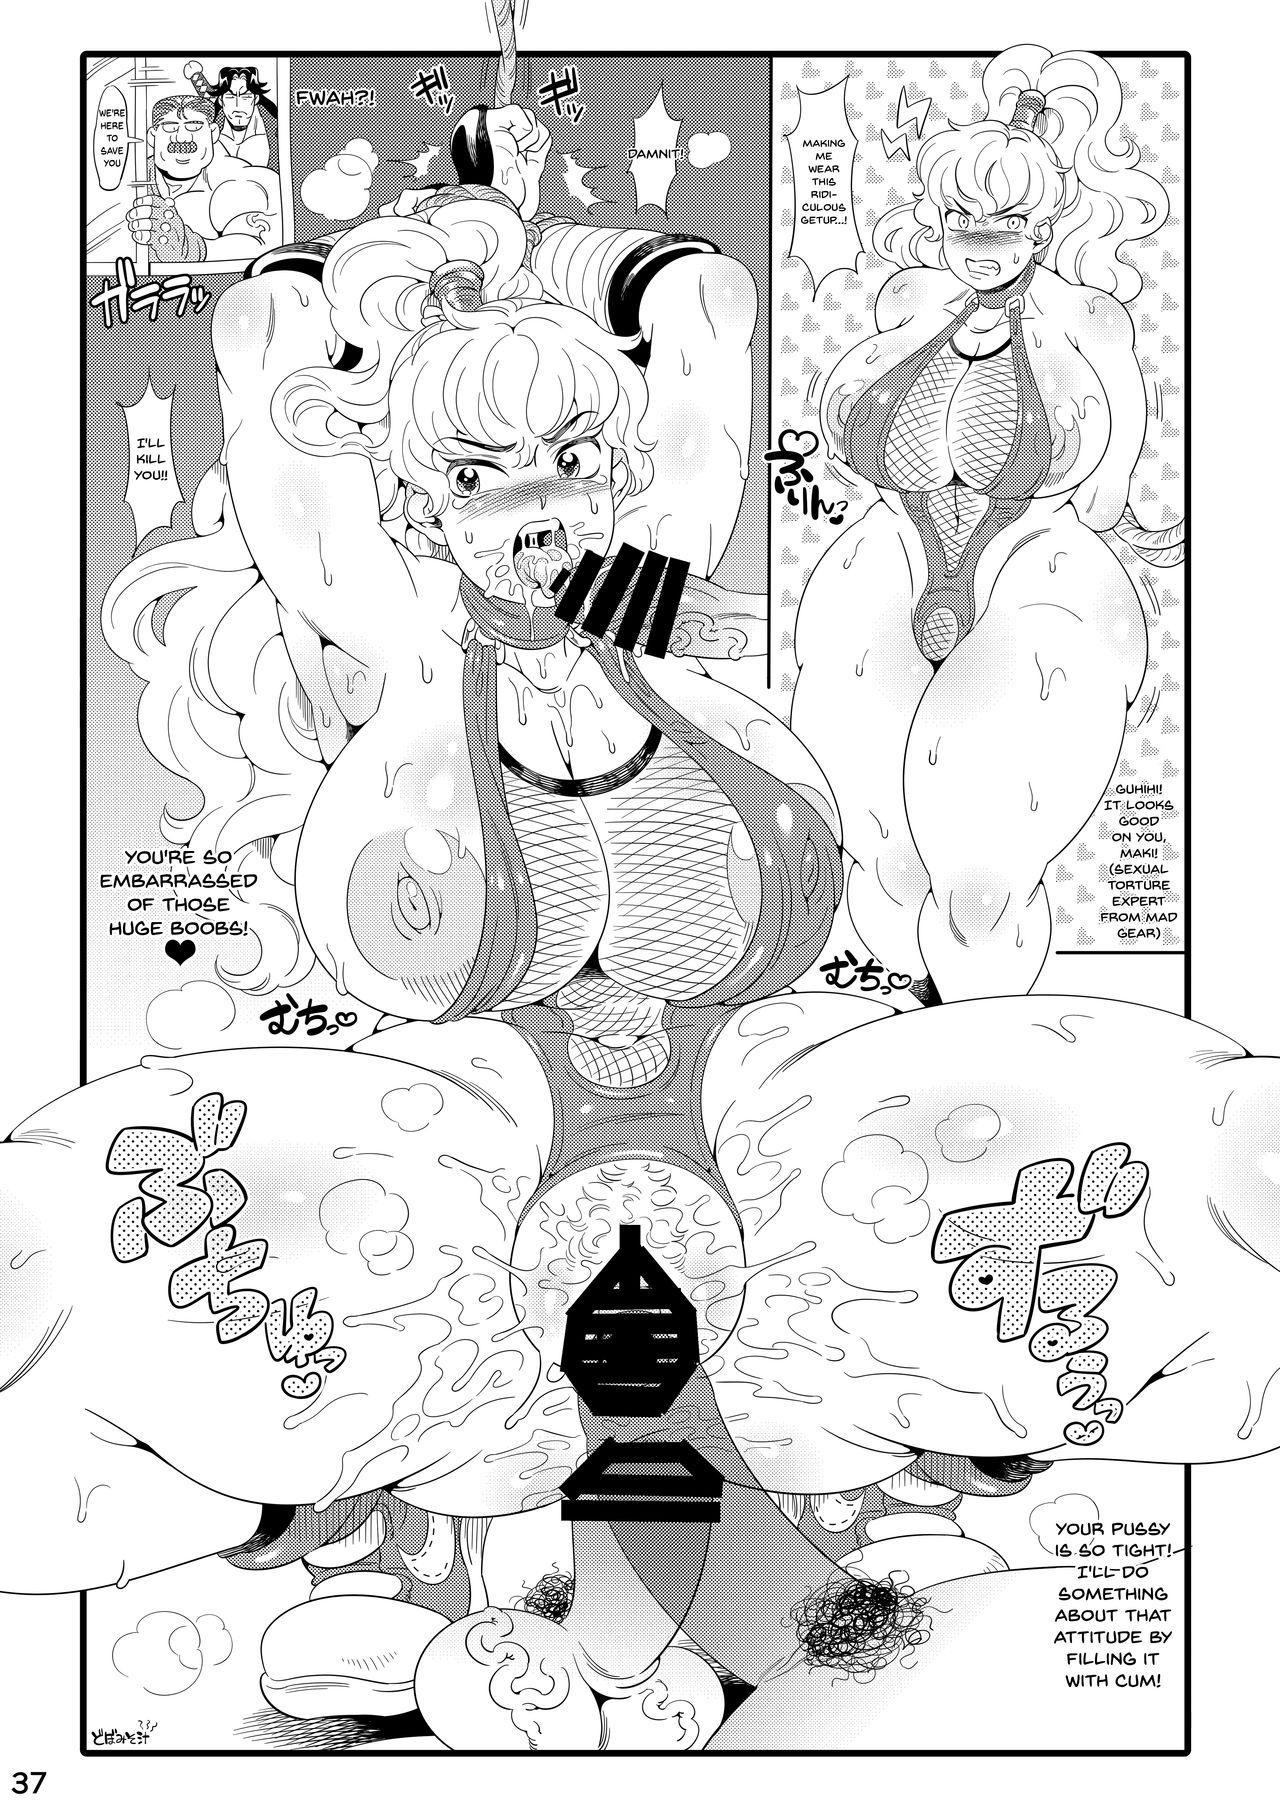 [POWERPLAY (Various)] CAPCOM (& MORE!) VS FIGHTING GIRLS Swimsuit & Gangbang Special (Various) [English] {Doujins.com} [Digital] 33